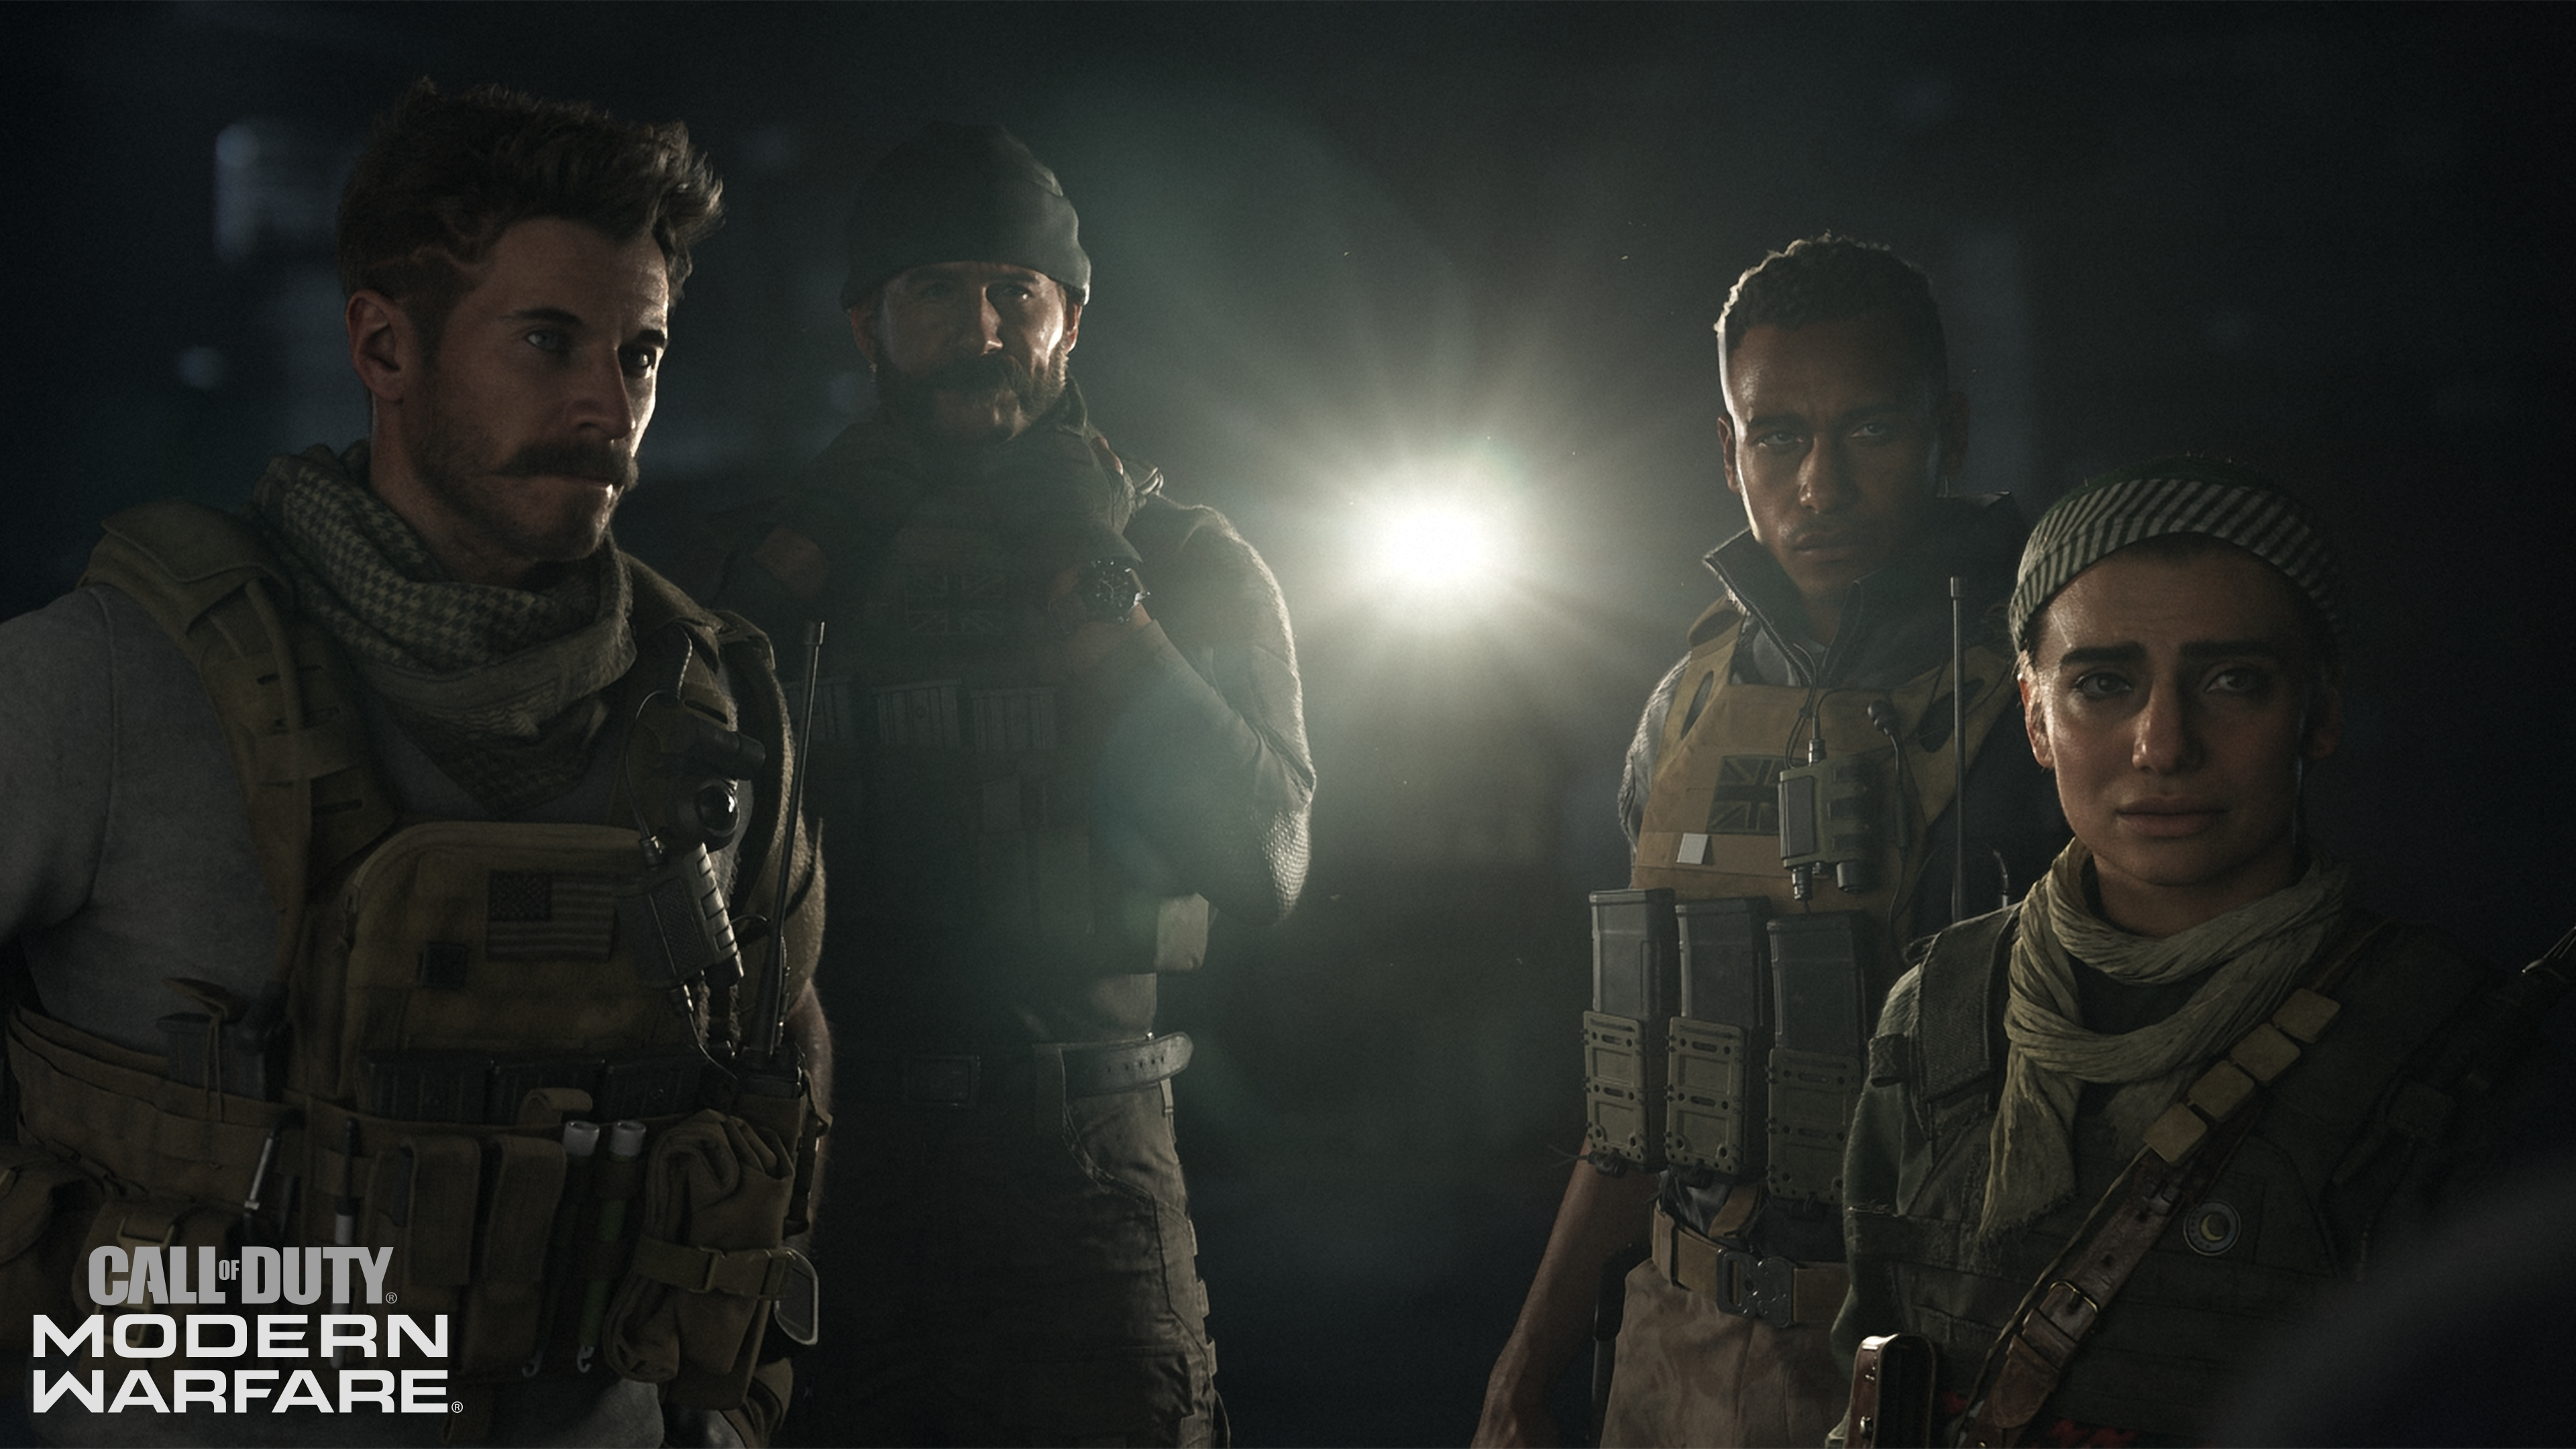 Call Of Duty Modern Warfare Video Game 2019 Photo